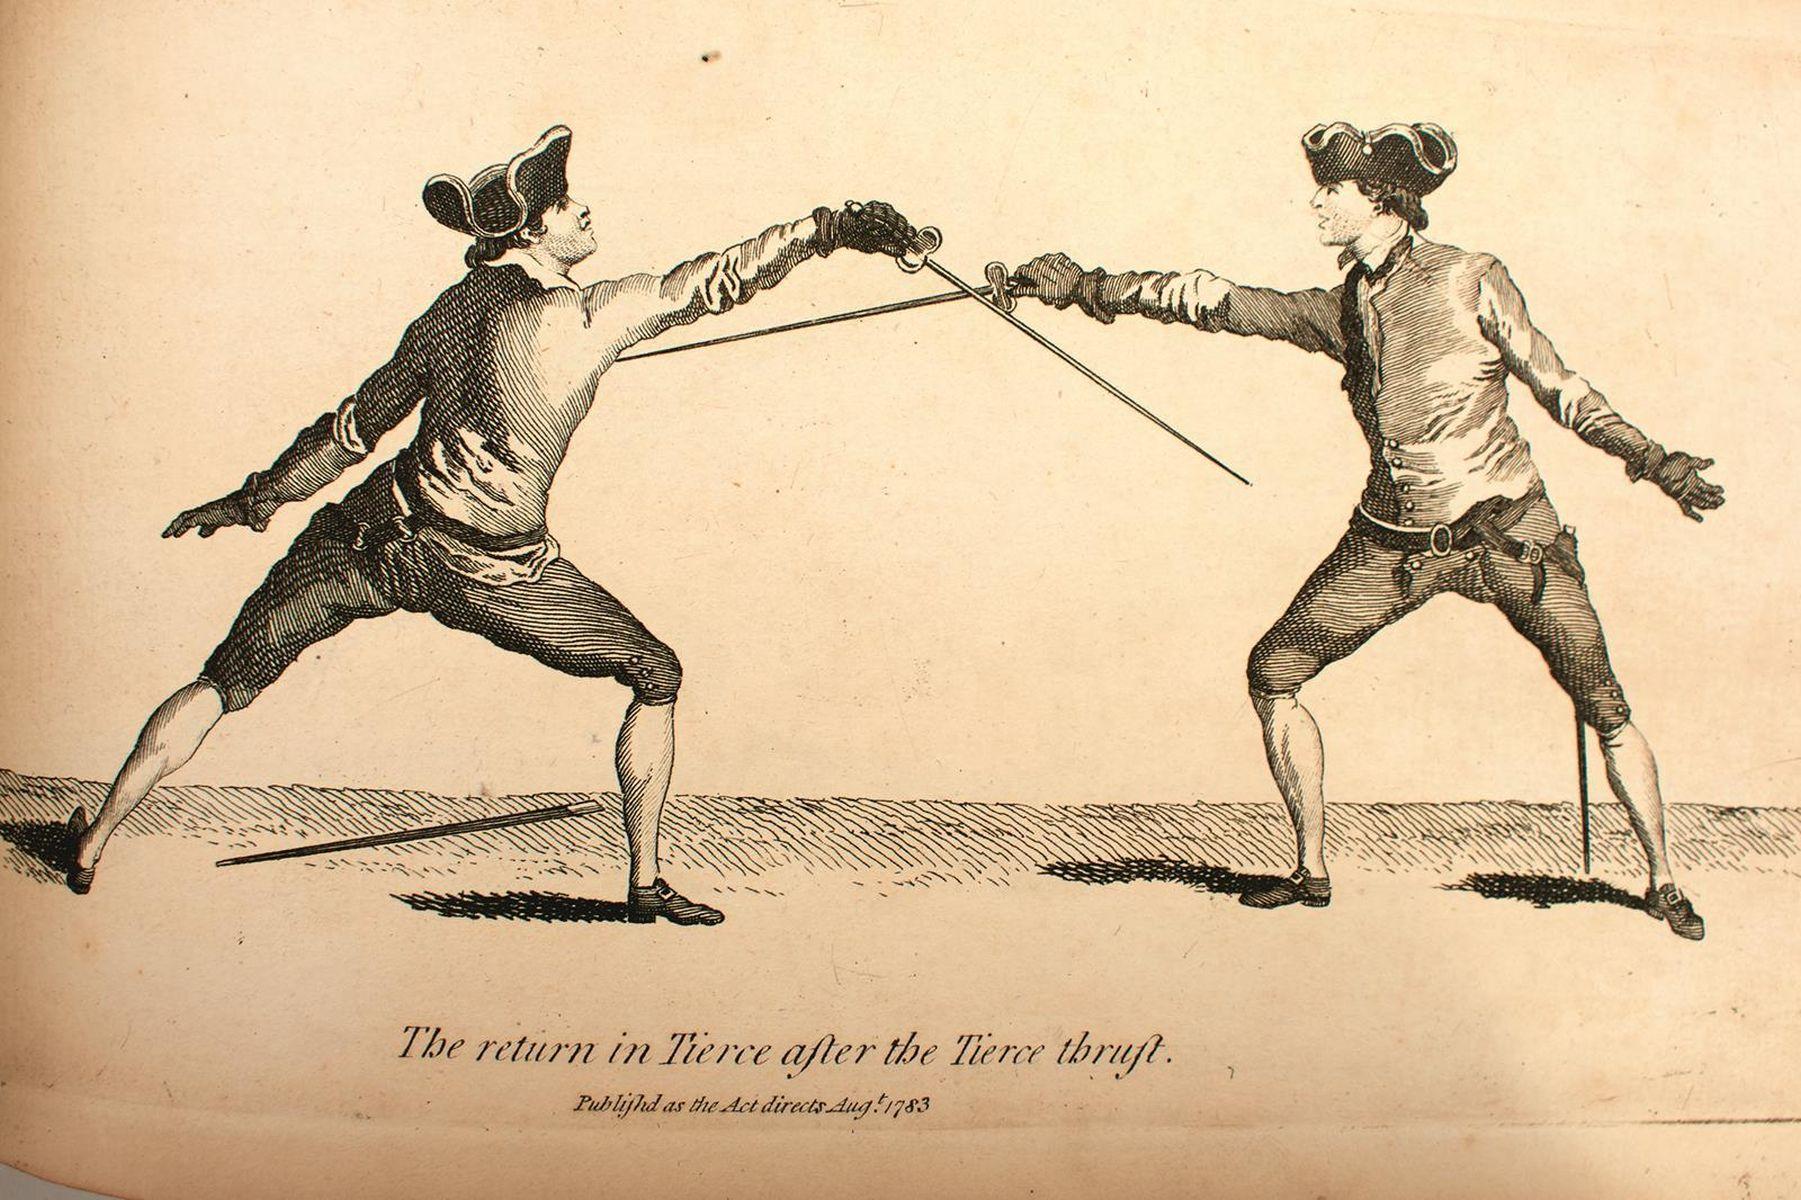 BOOKS: ANGELO DOMENICO (1717?-1802) THE SCHOOL OF FENCING (L'ECOLE DES ARMES), trans. Rowlandson,